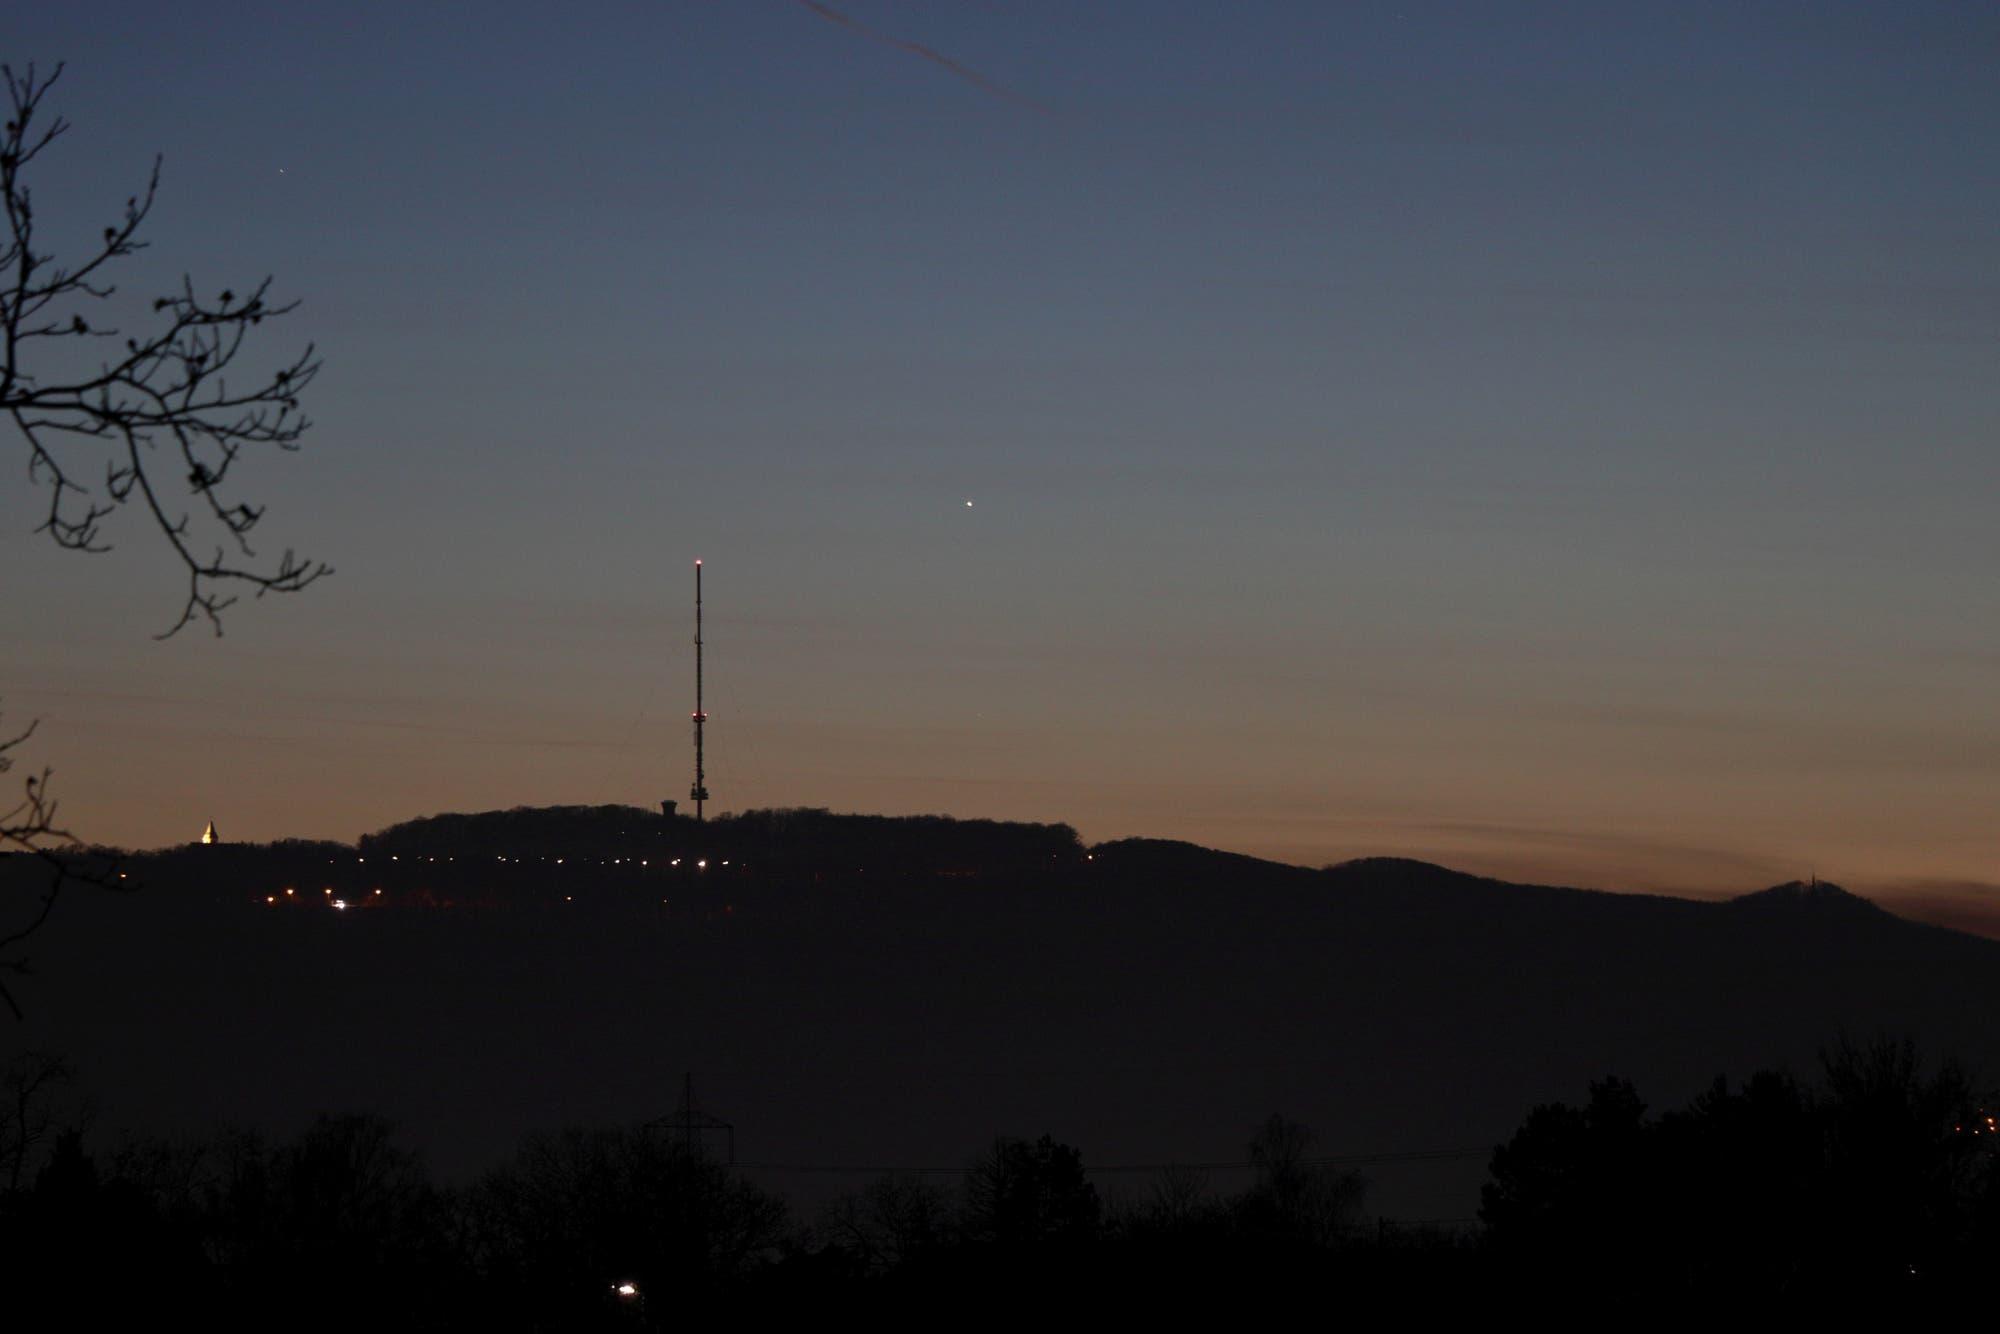 Merkur am Abendhimmel - 2